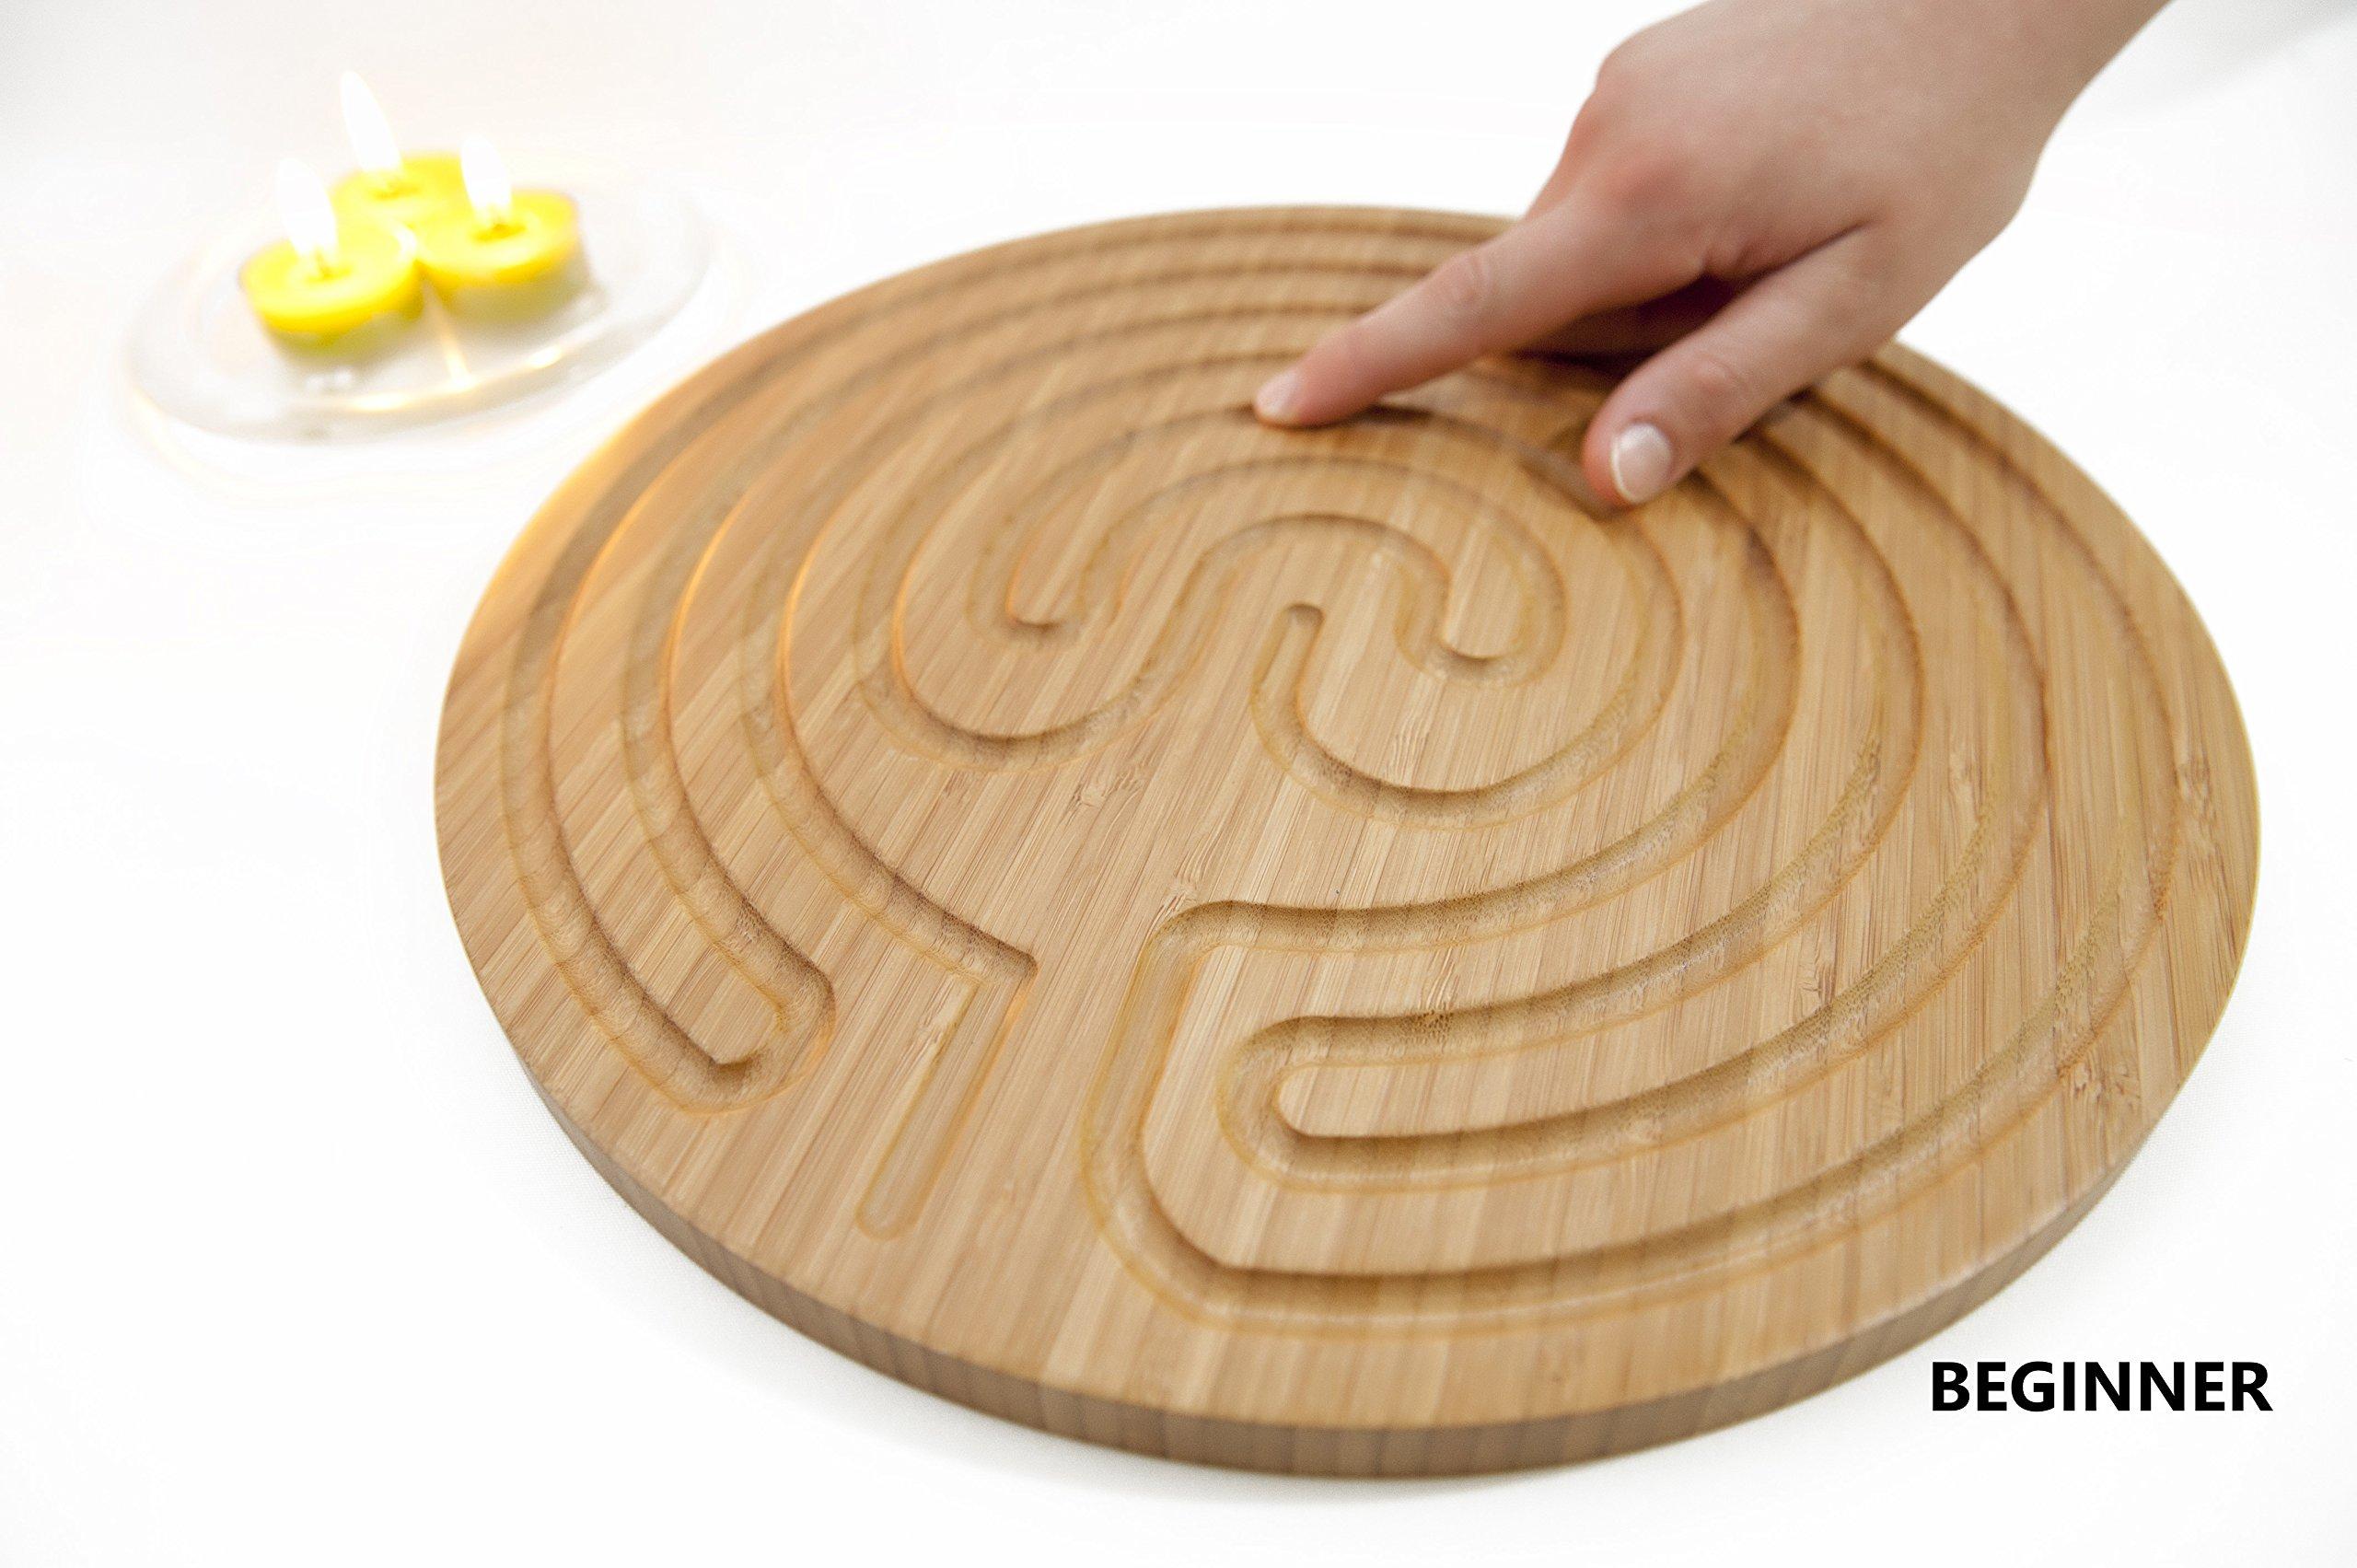 PerfectBambooSpoon Fine Motor Skills and Hand Eye Coordination. Fine Motor Skills Toys. Finger Toys for Brain Development. Bamboo Motor Skills and Brain Development Tool.